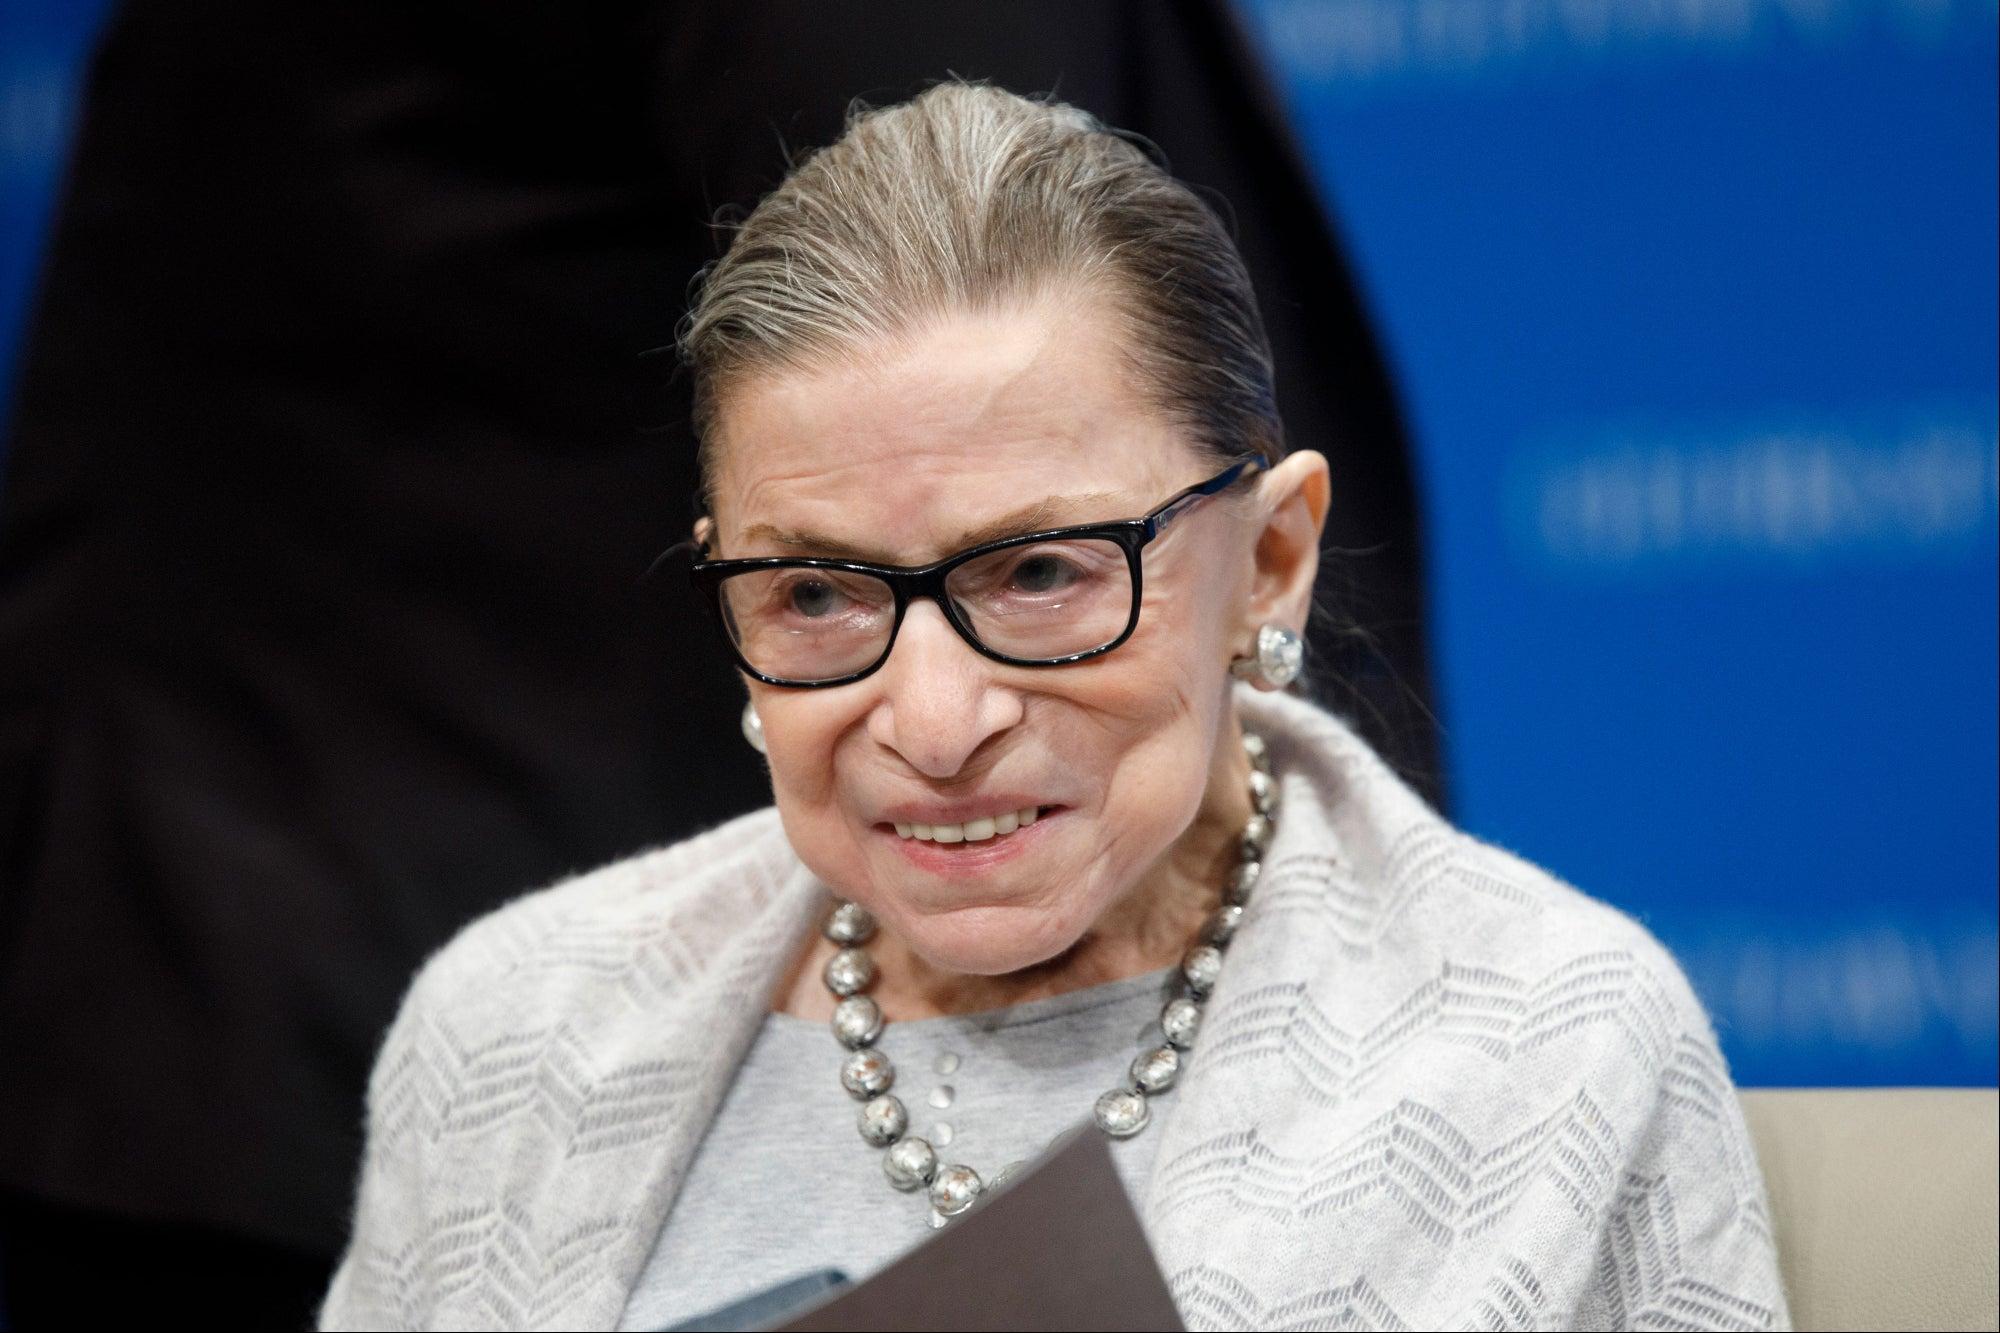 Remembering Ruth Bader Ginsburg's Entrepreneurial Spirit